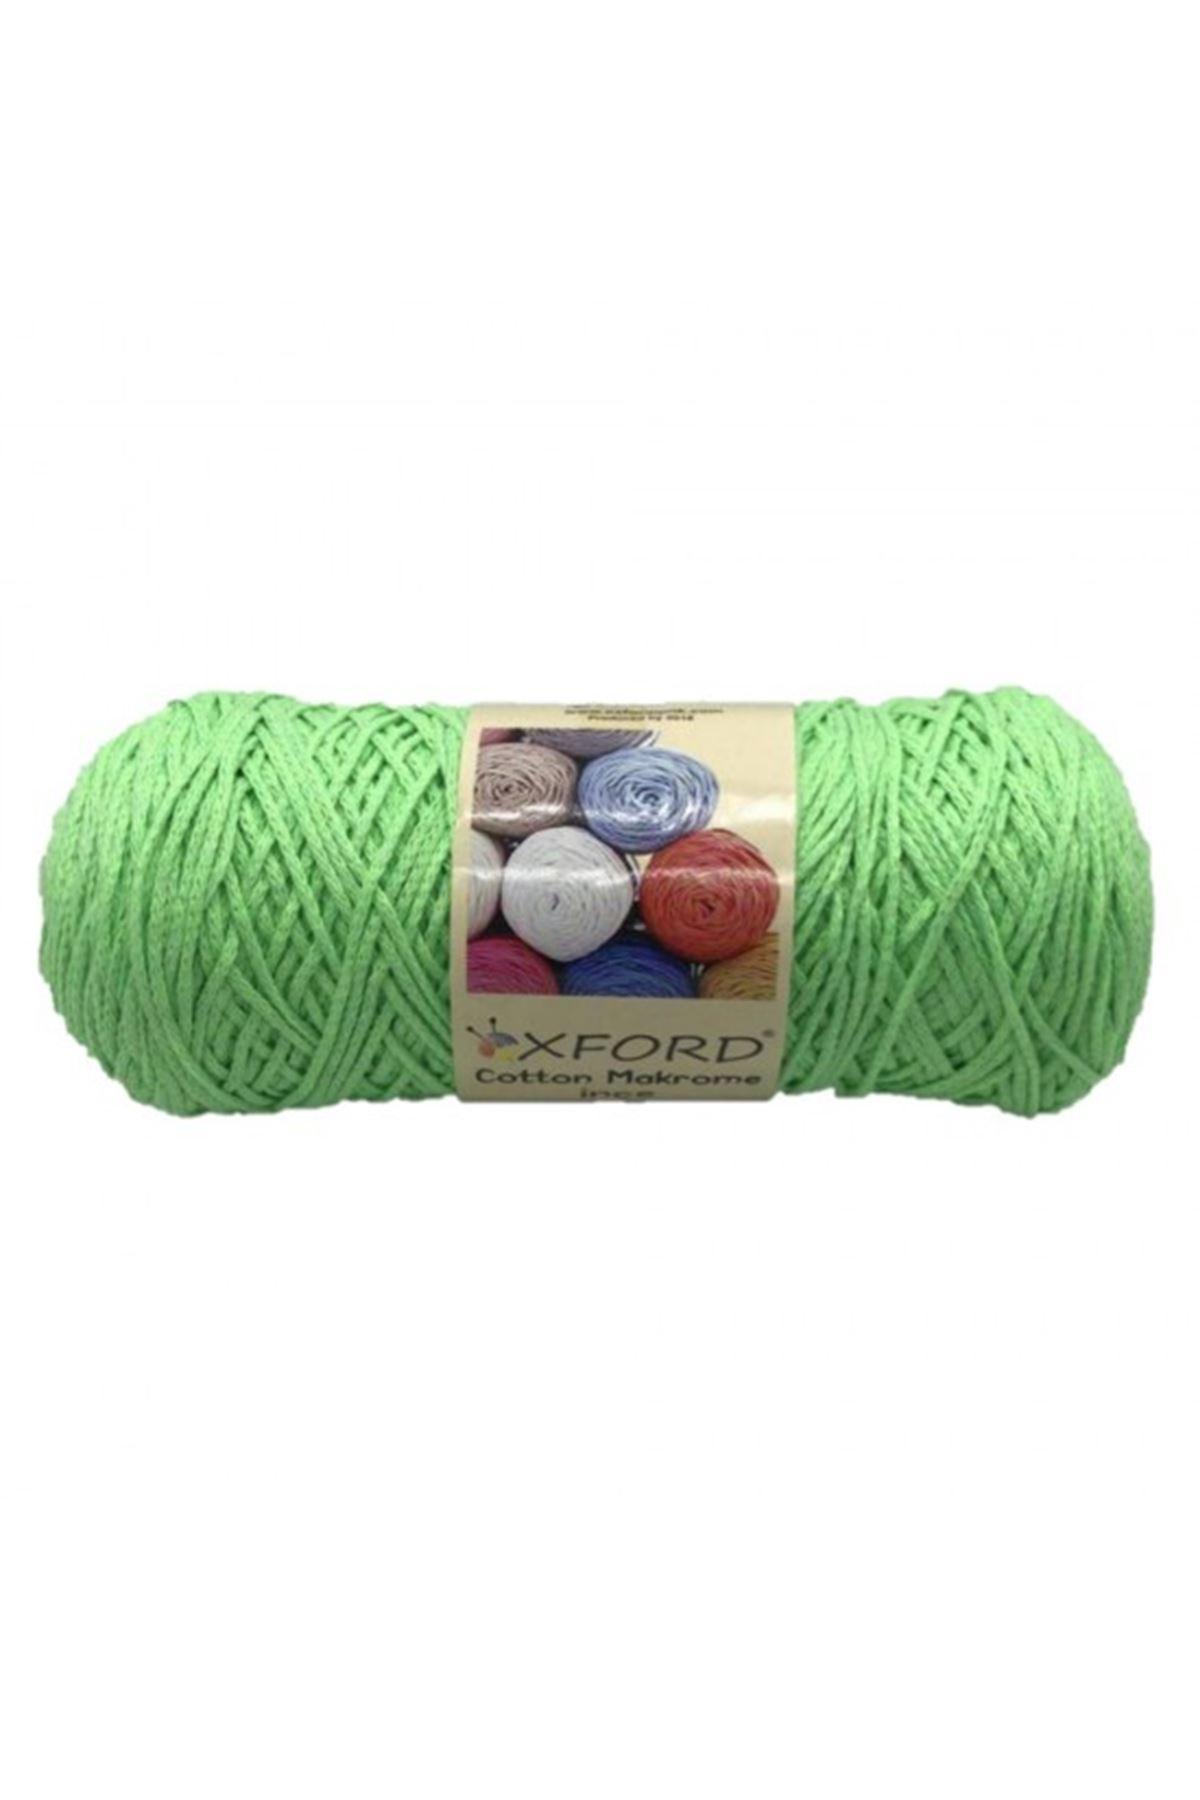 Cotton Makrome İnce - 40100 - Elma Yeşili